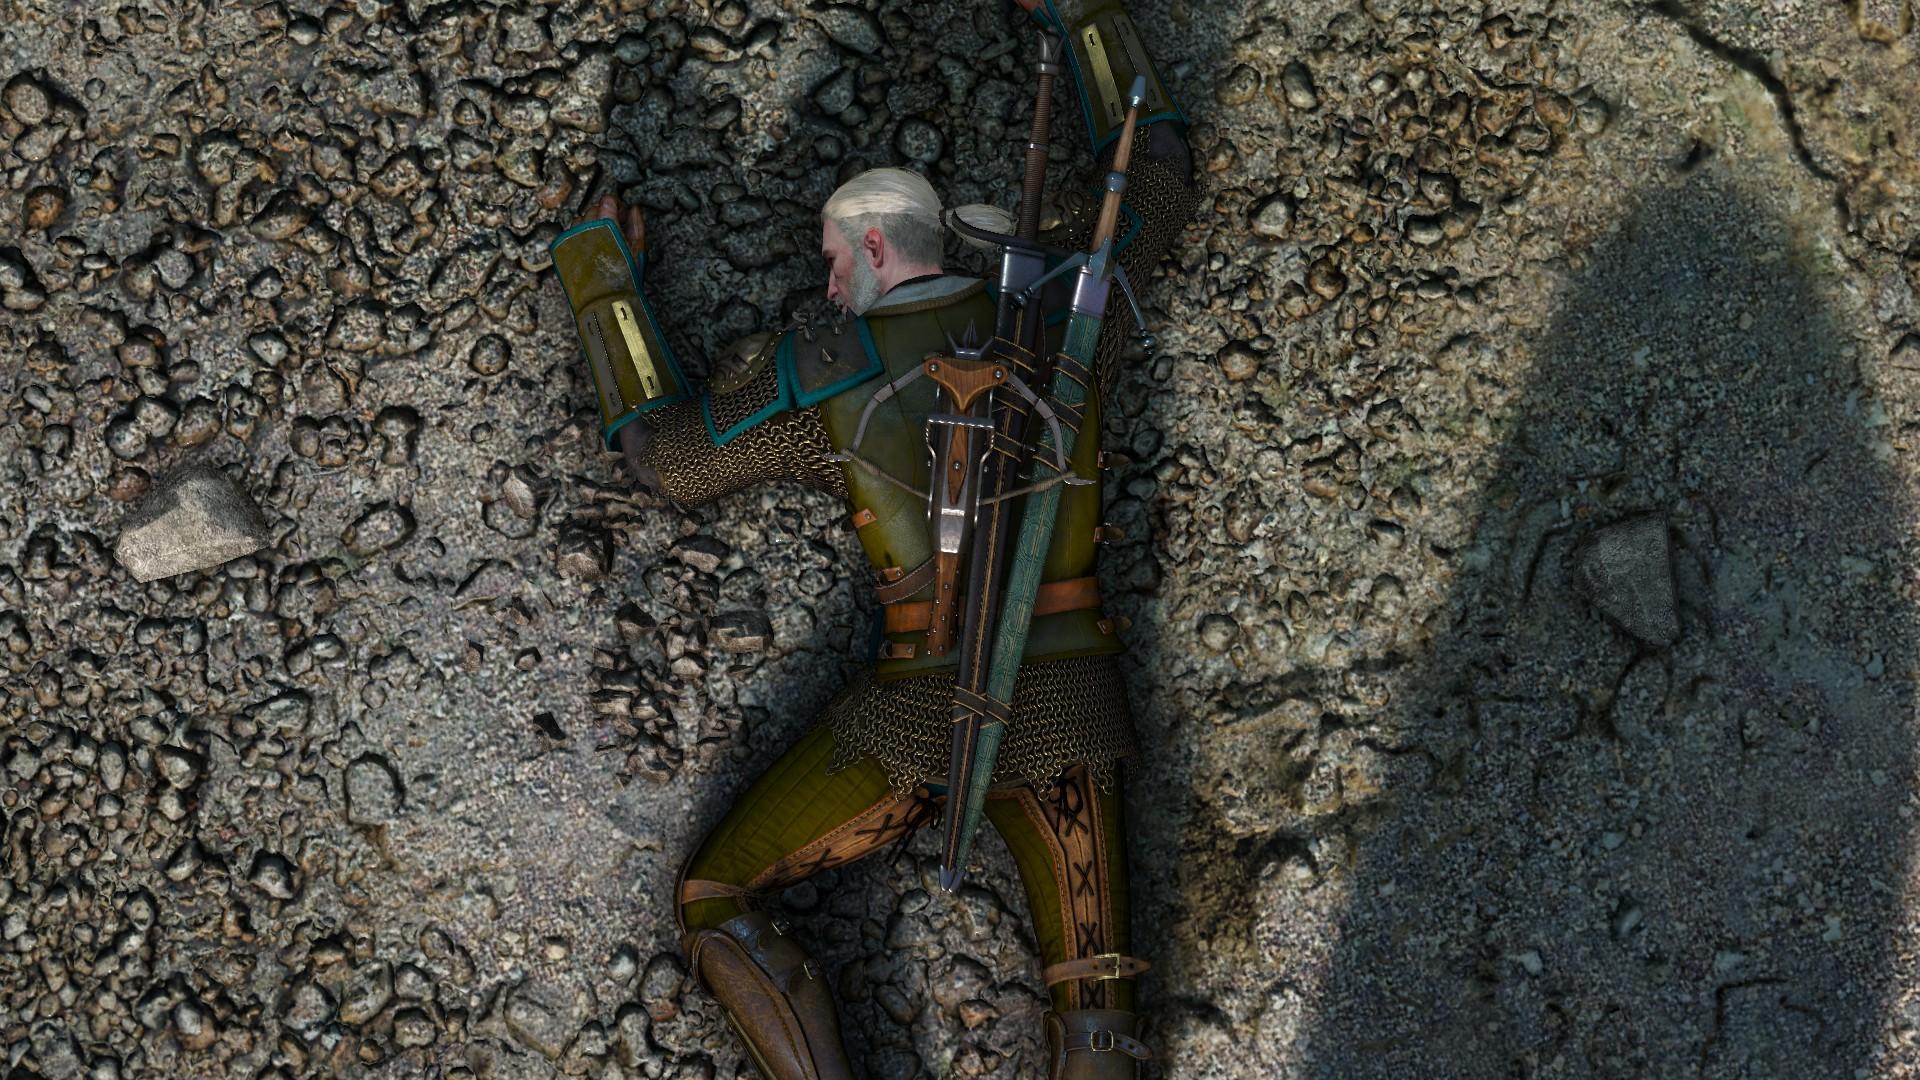 292030_screenshots_20170720230108_1.jpg - Witcher 3: Wild Hunt, the